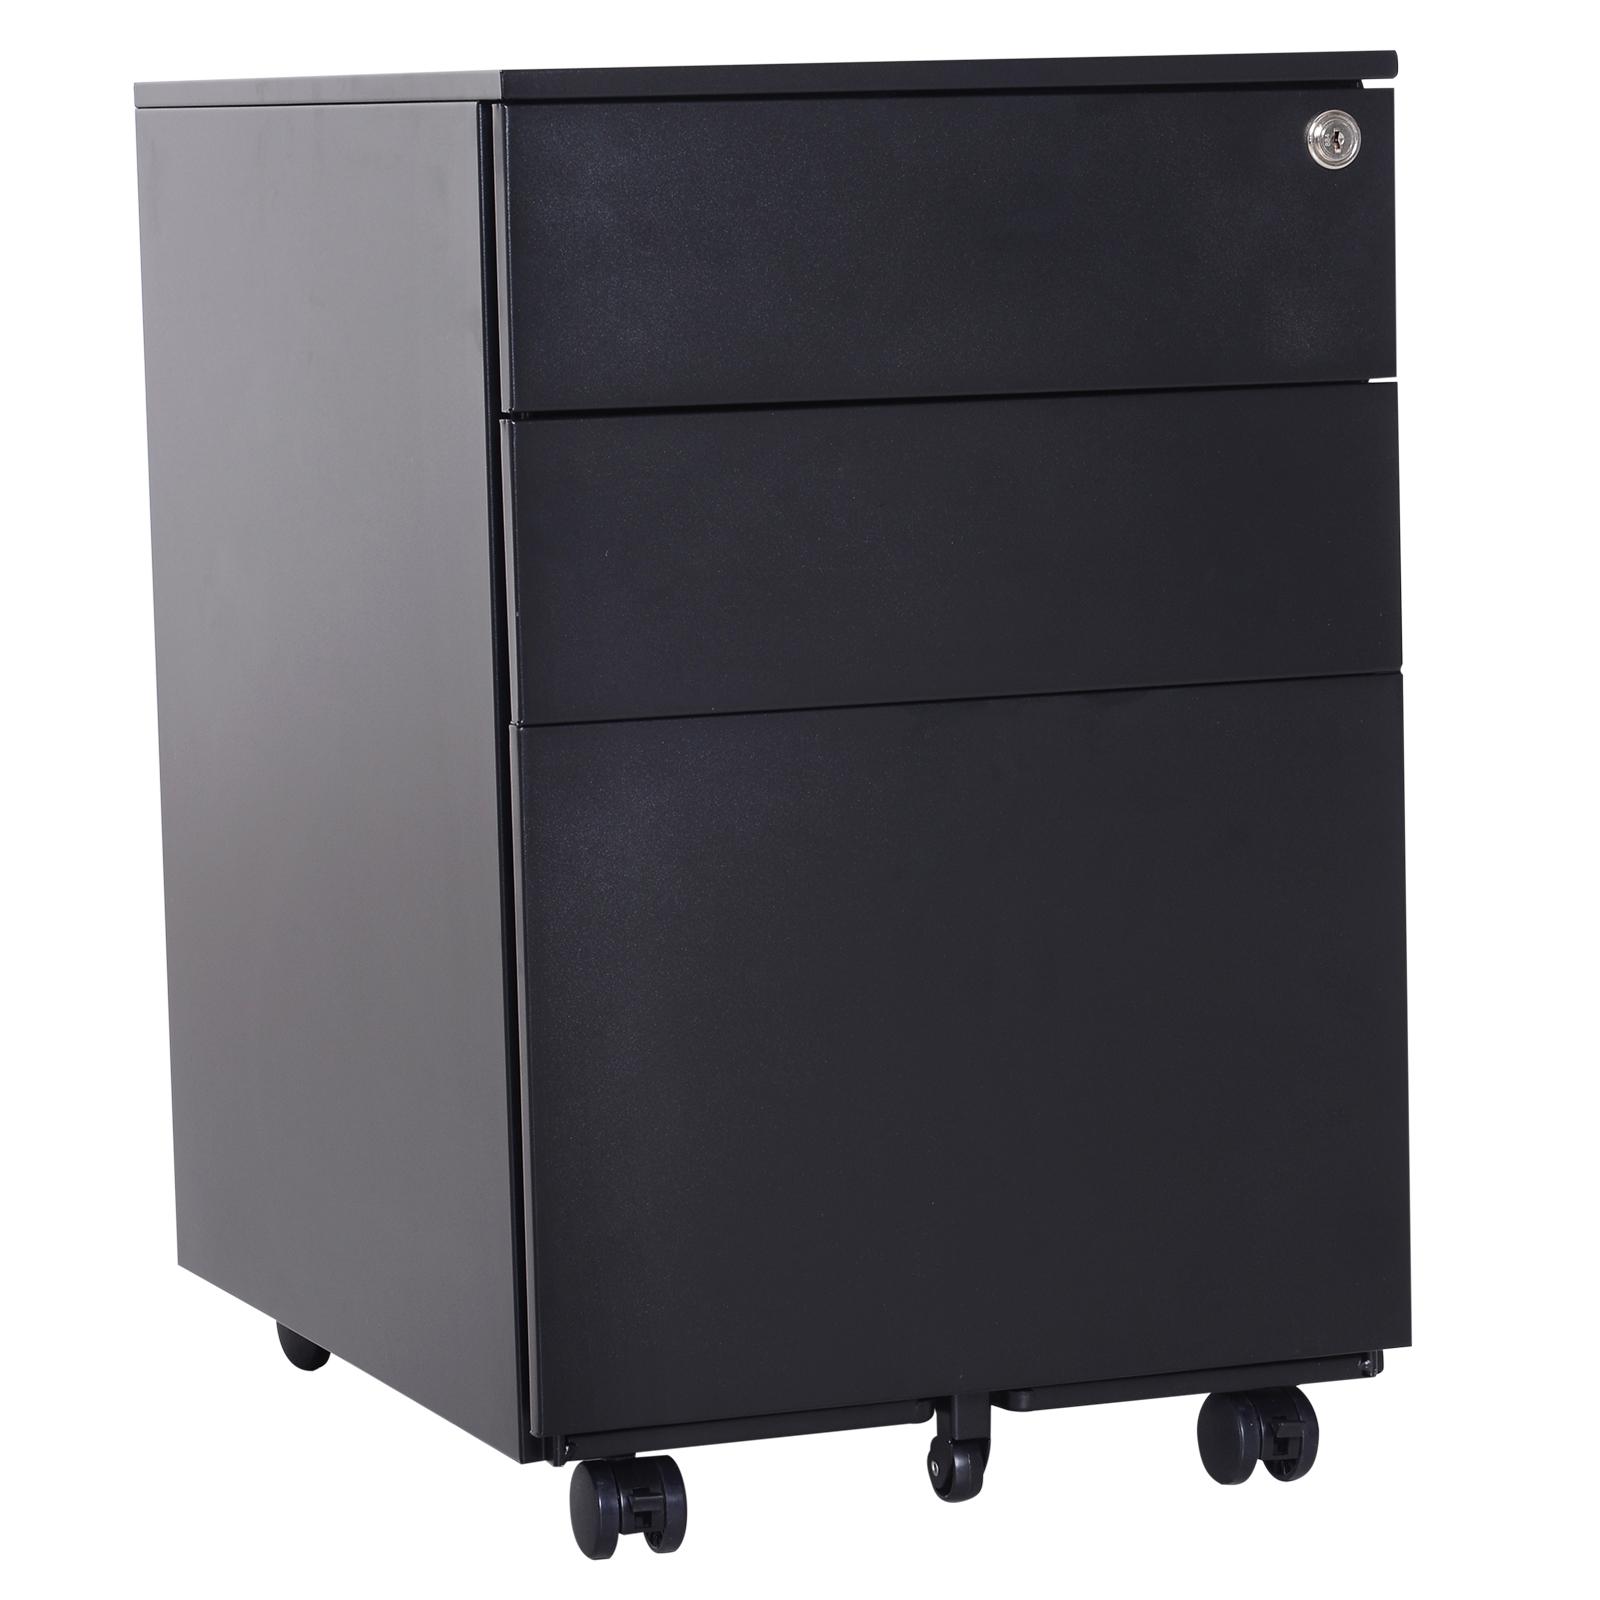 Incroyable Details About 24u201d Steel 3 Drawer Home Office Under Desk Filing Cabinet W/  Lock On Wheels